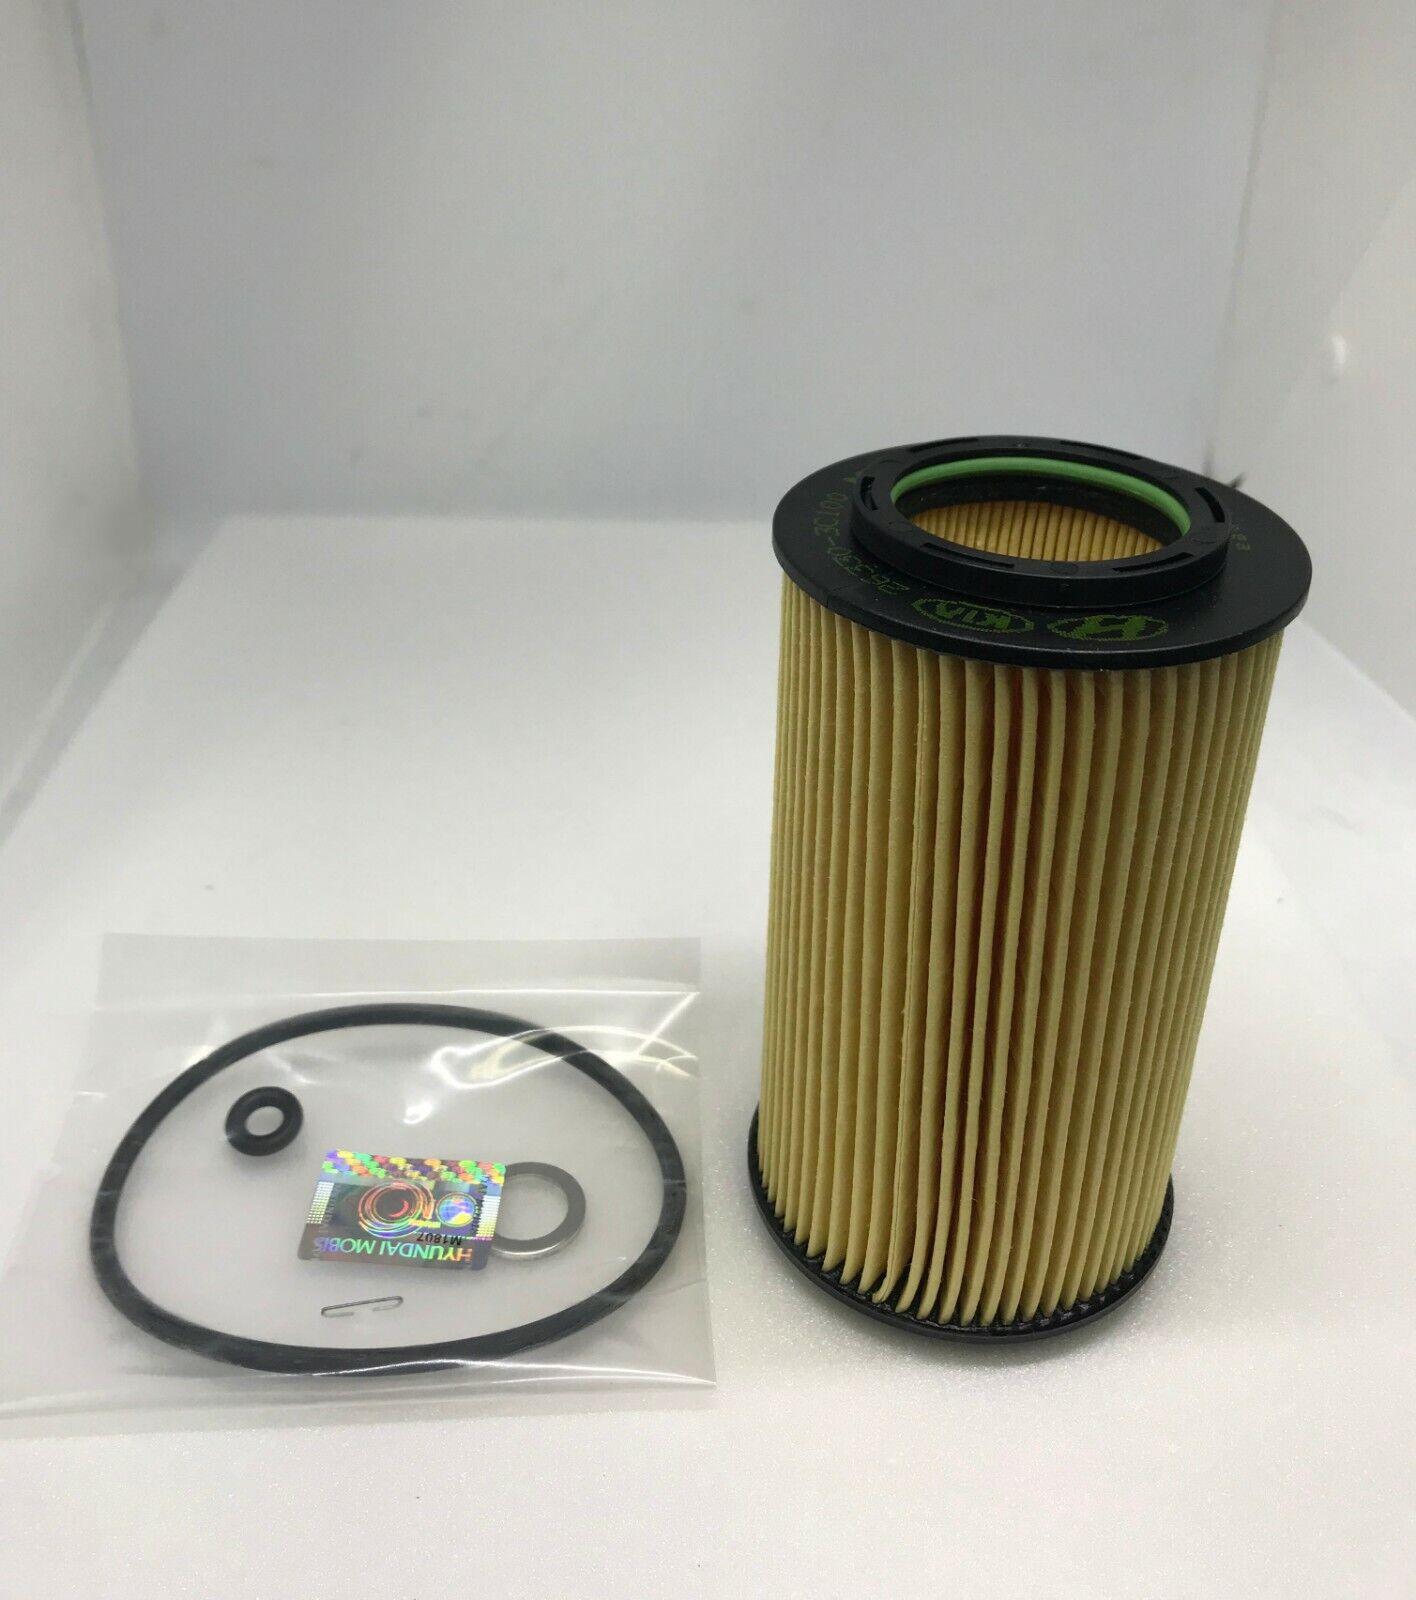 Oil filter 26320-3C100 Washer for HYUNDAI Sonata Azera Veracruz Genesis